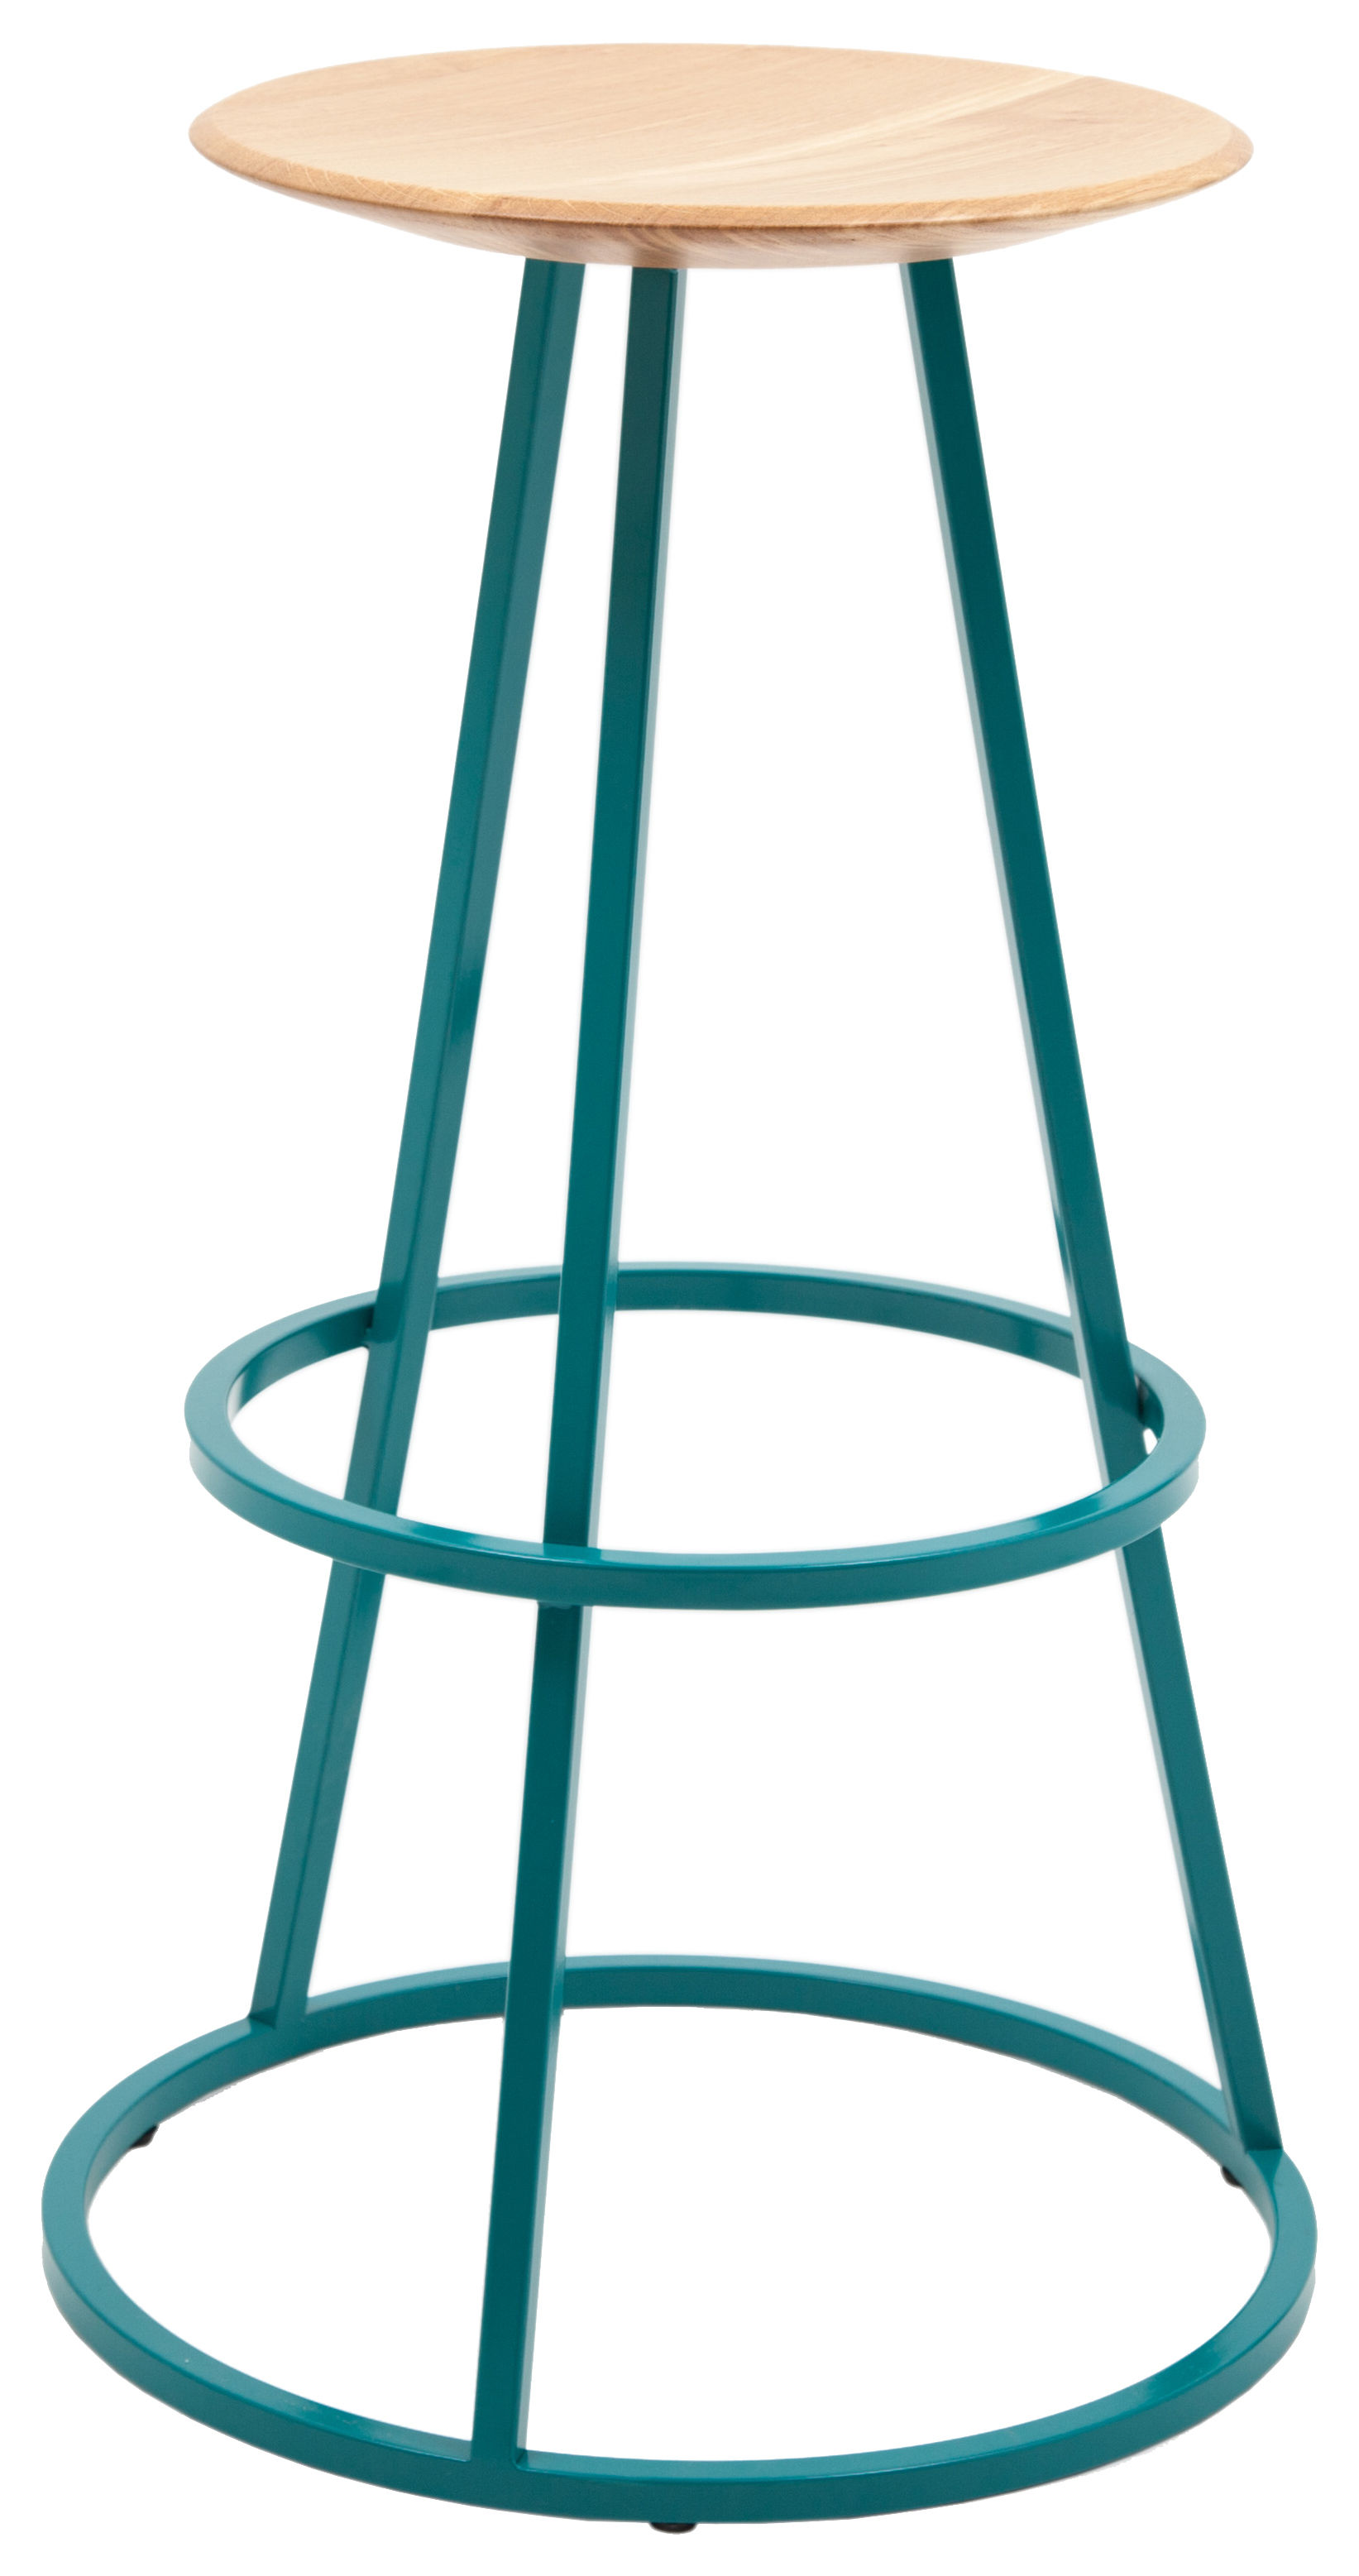 Grand Gustave Bar stool H 77 cm Wood & metal Aqua blue